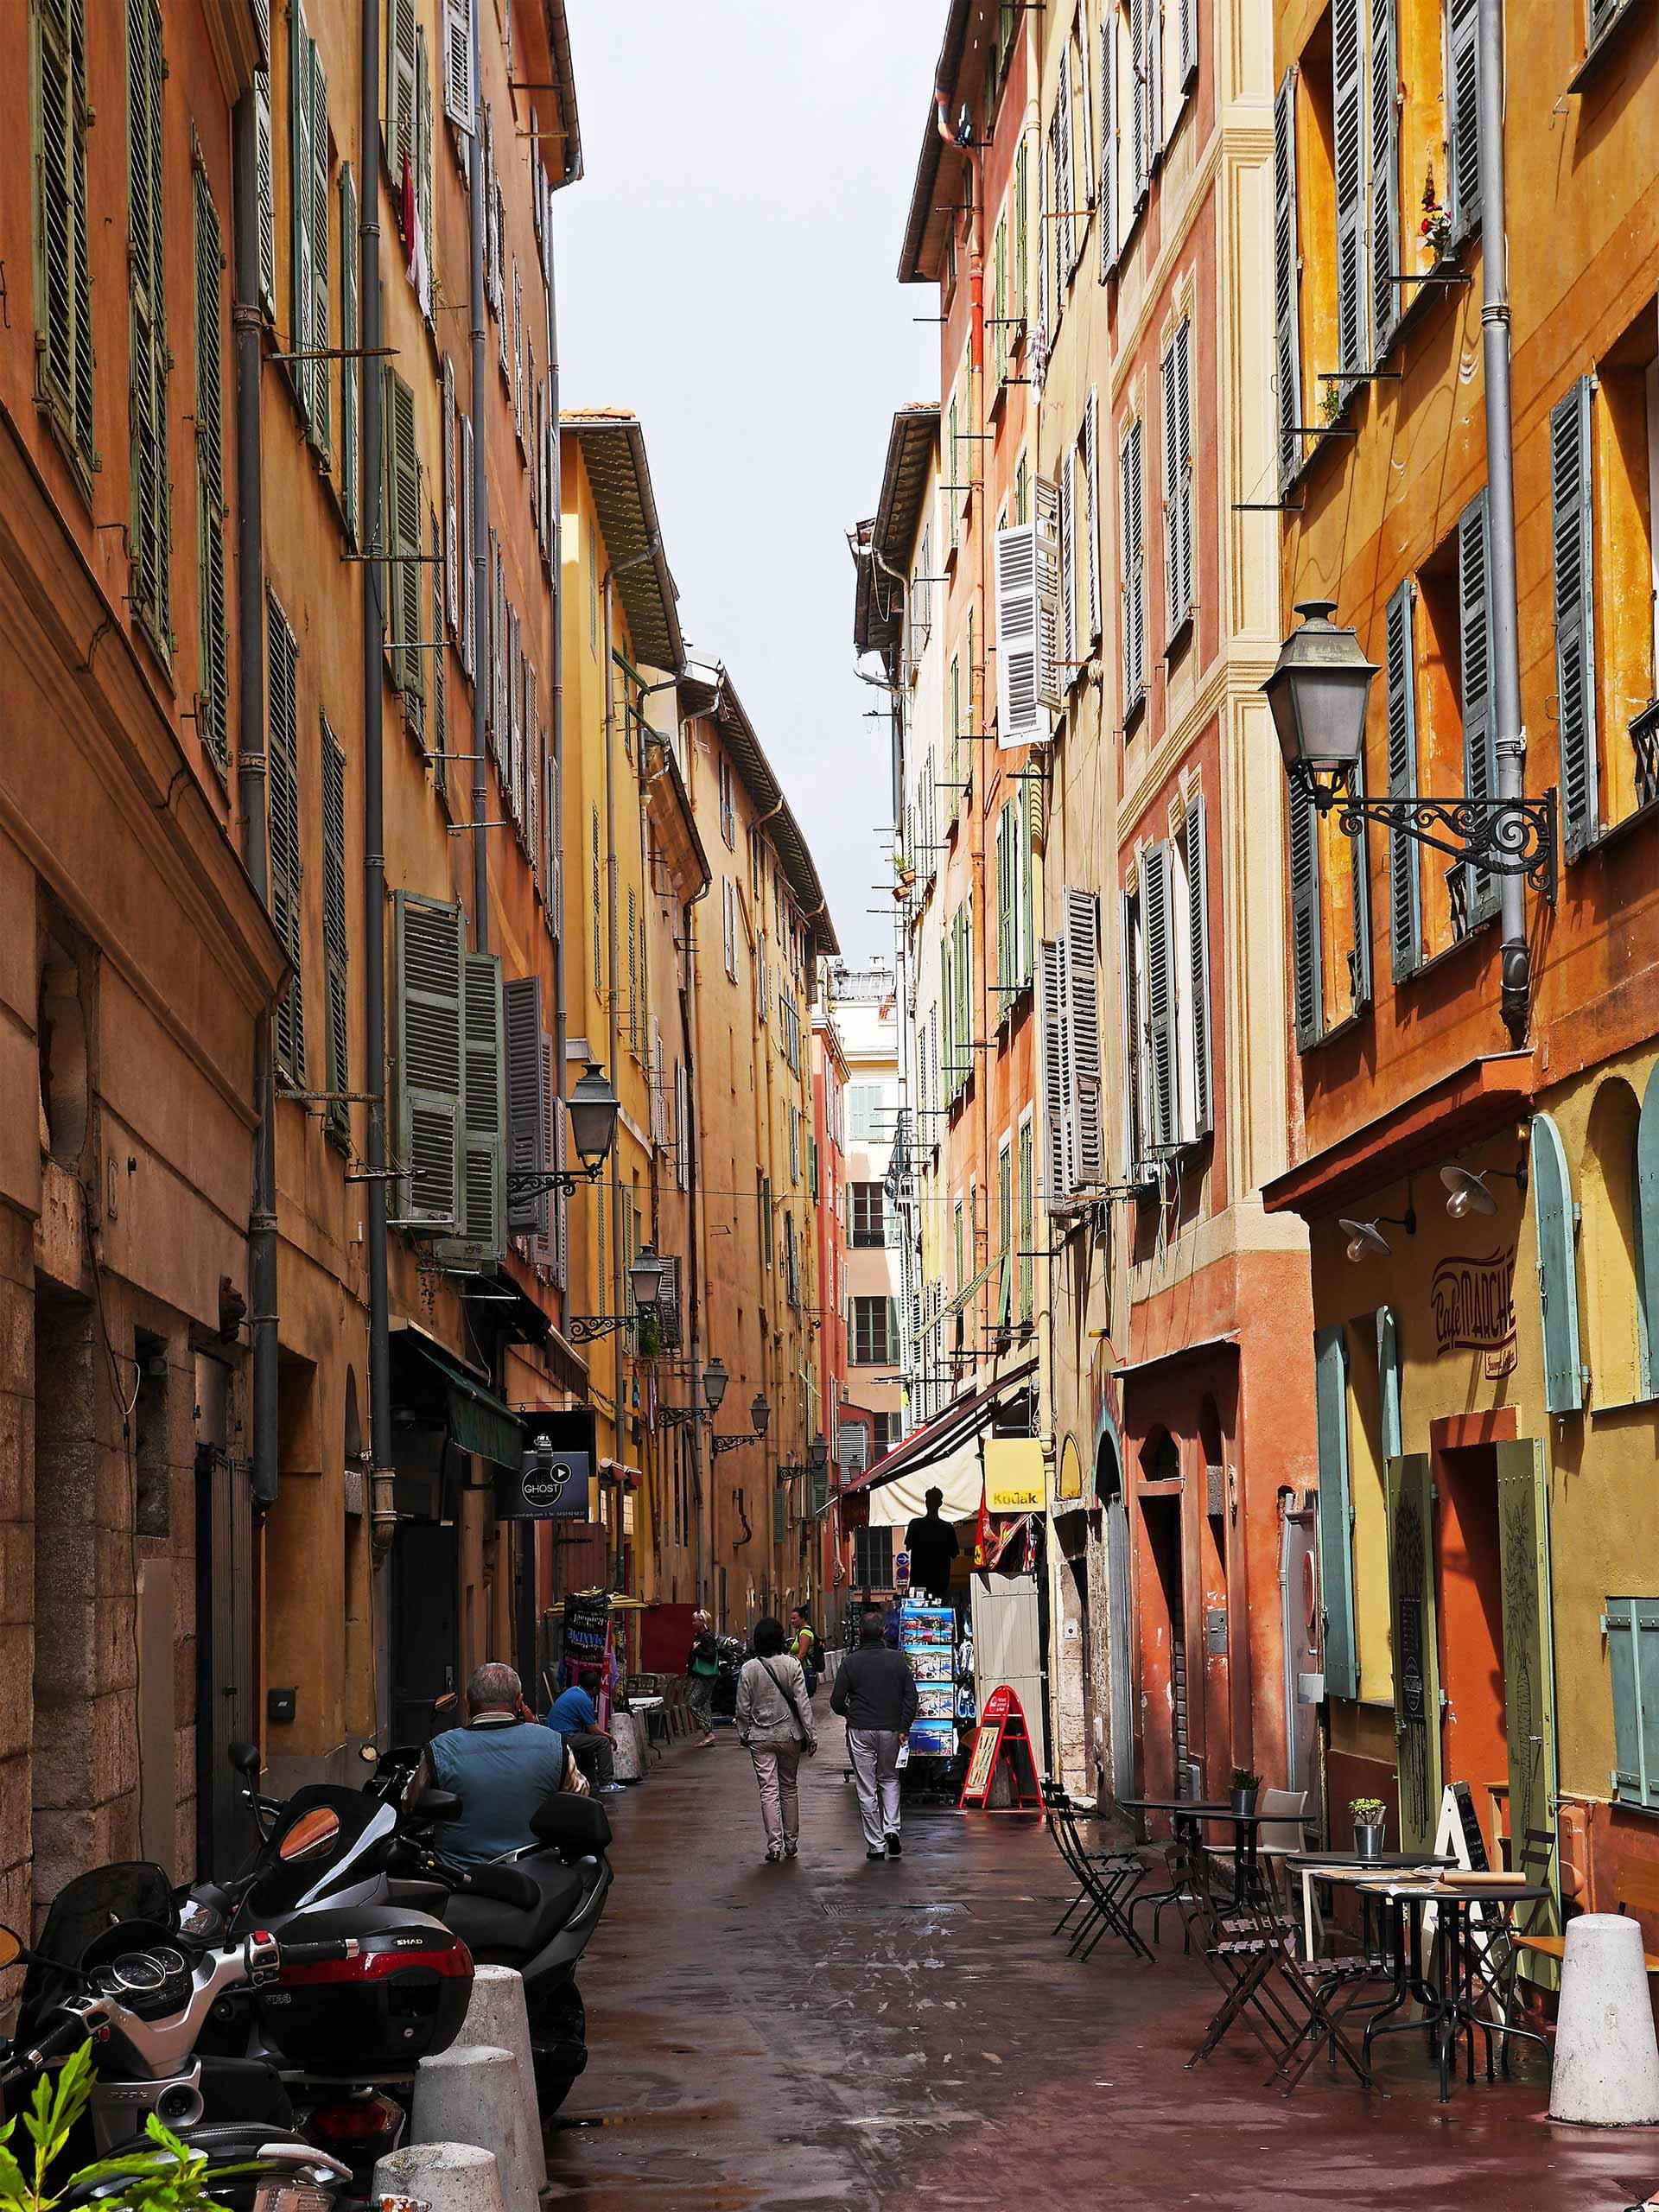 Gasse in Nizza